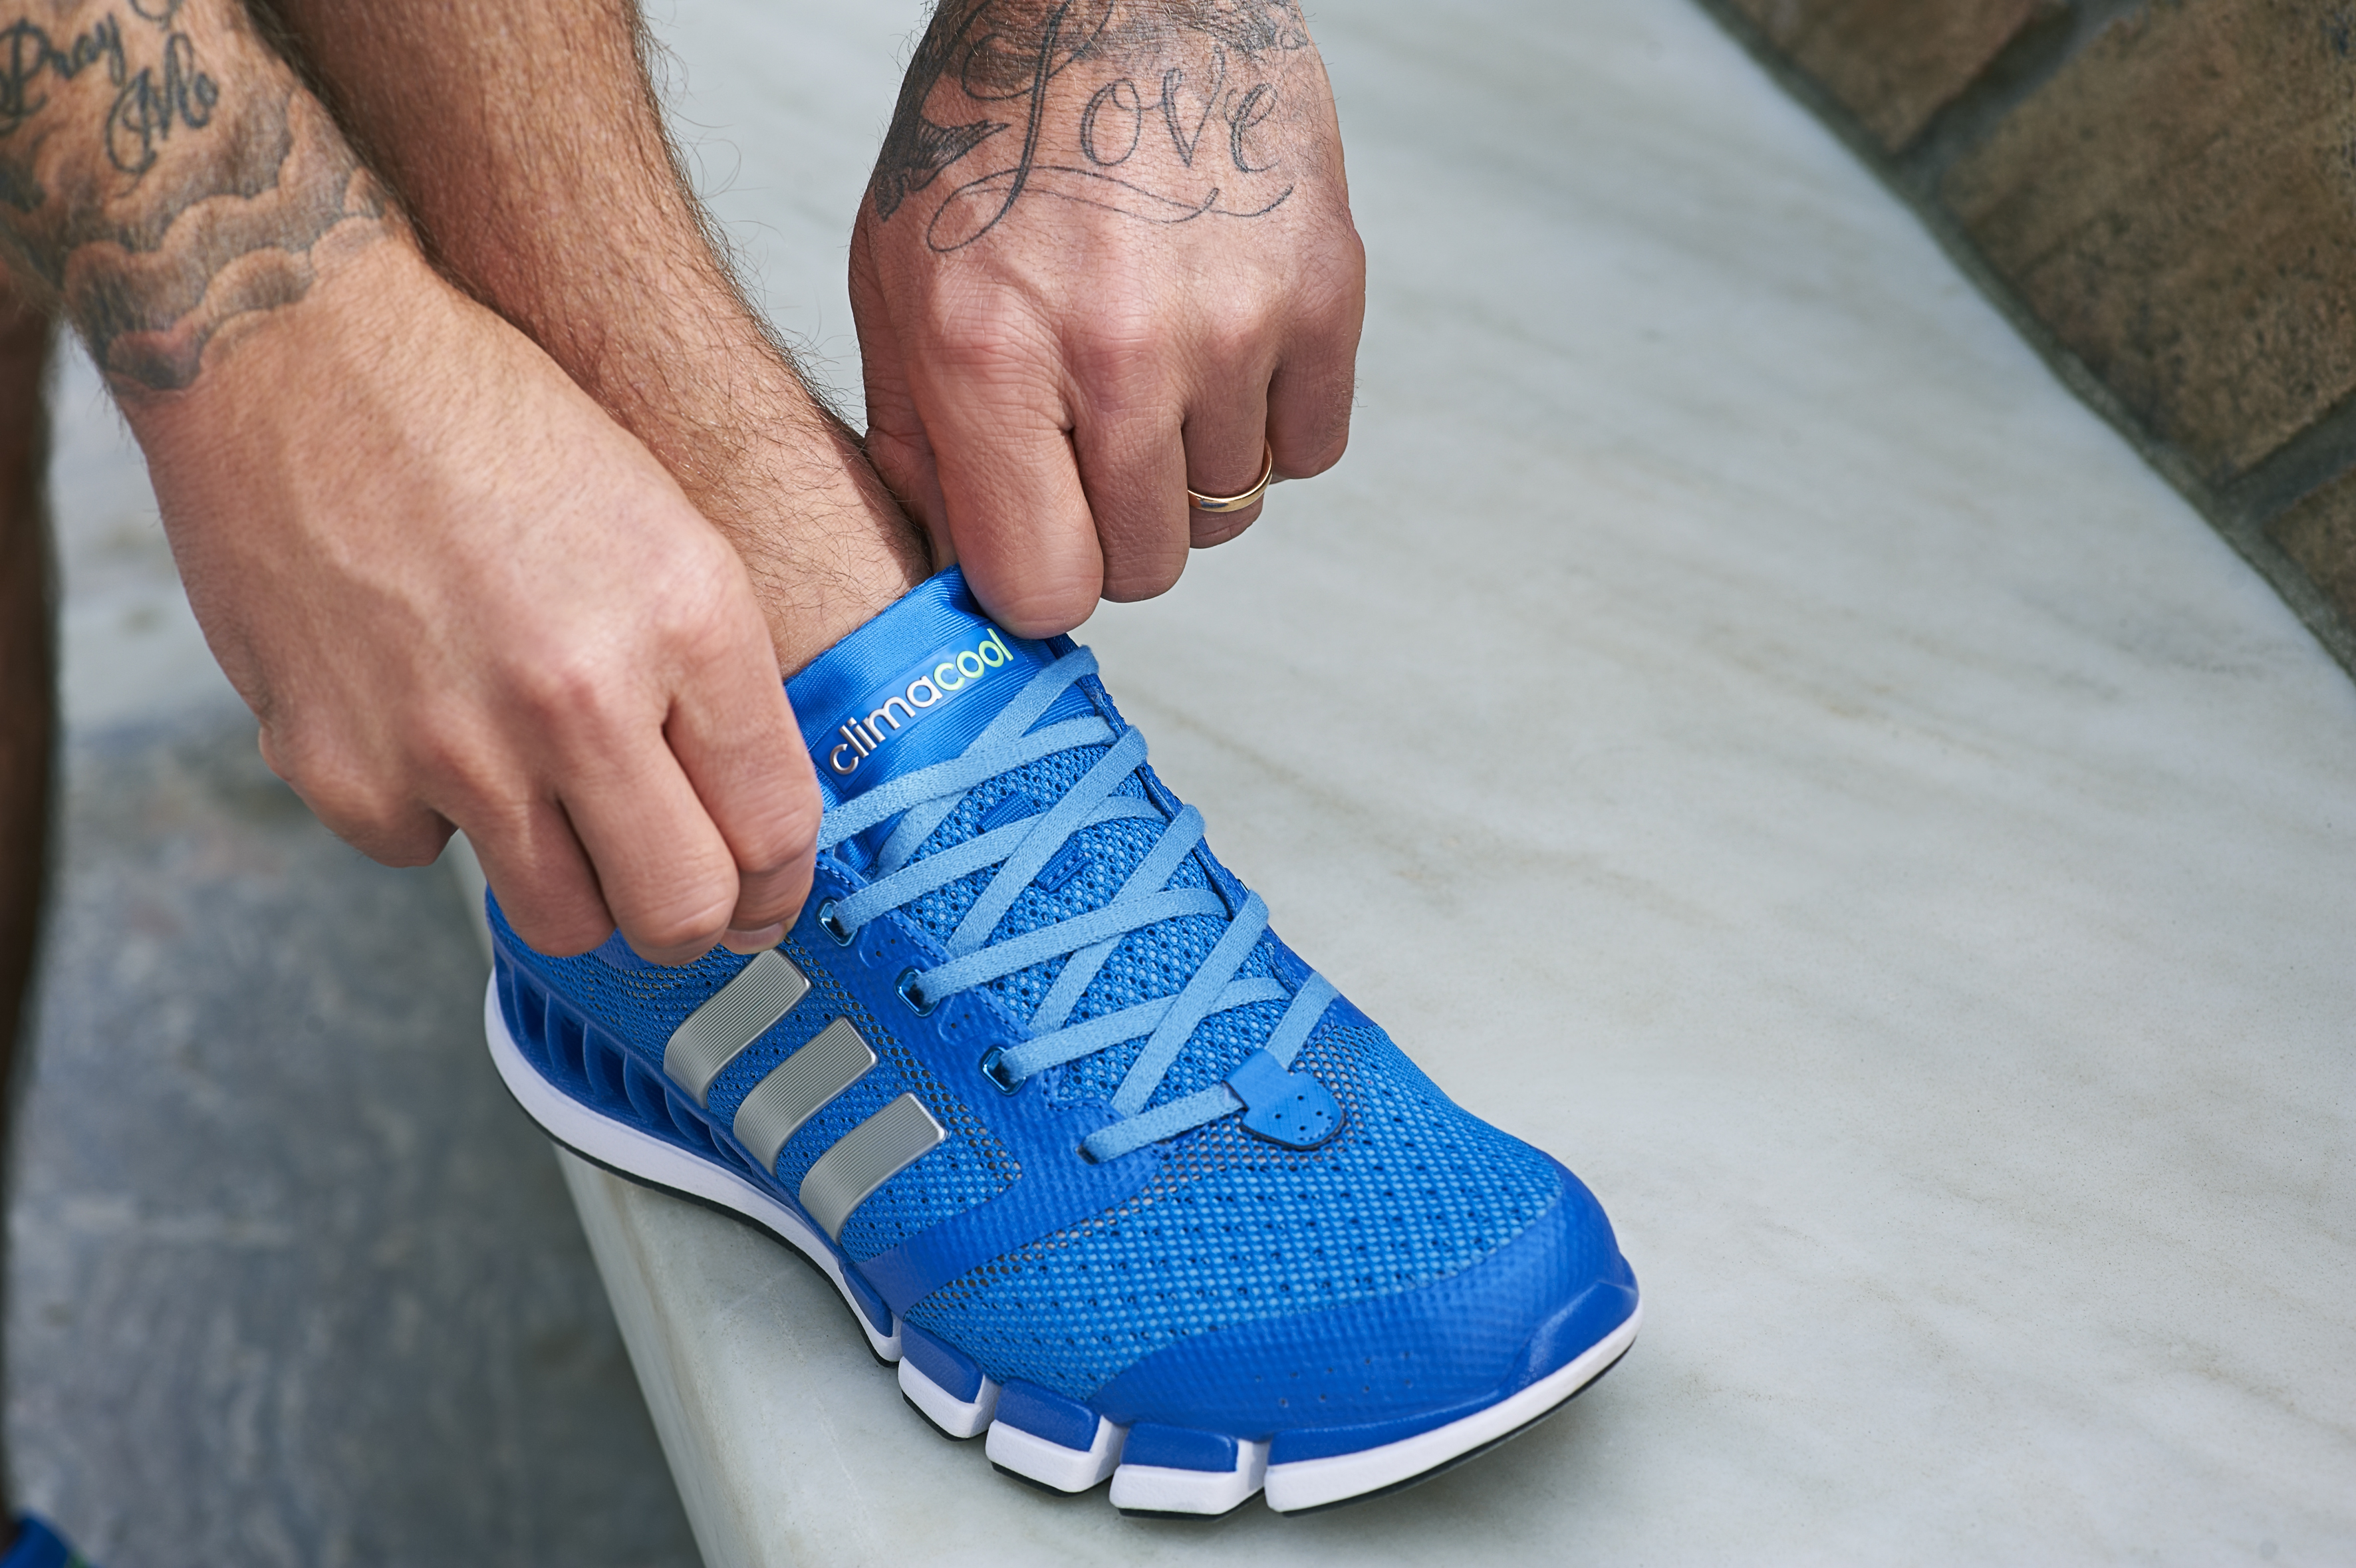 adidas climacool shoes blue